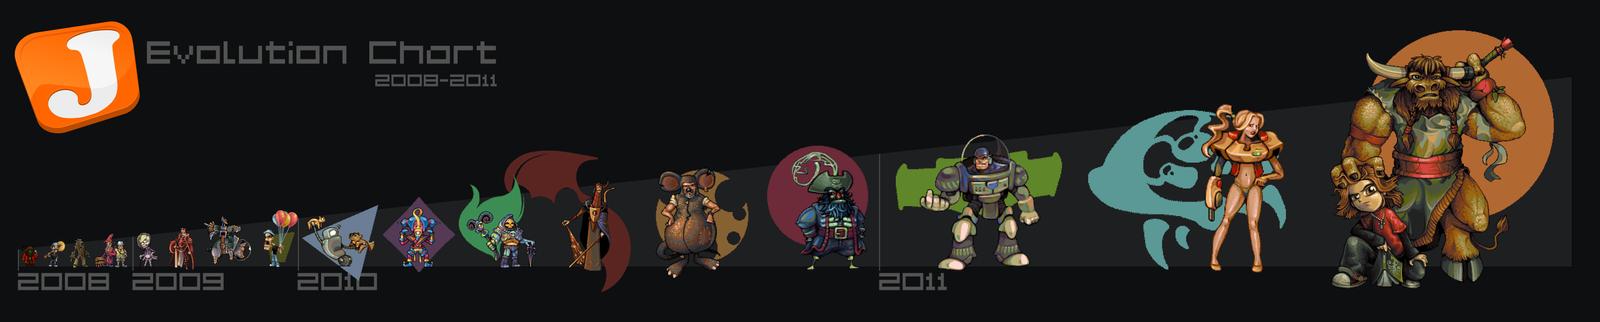 Evolution Chart by JINNdev